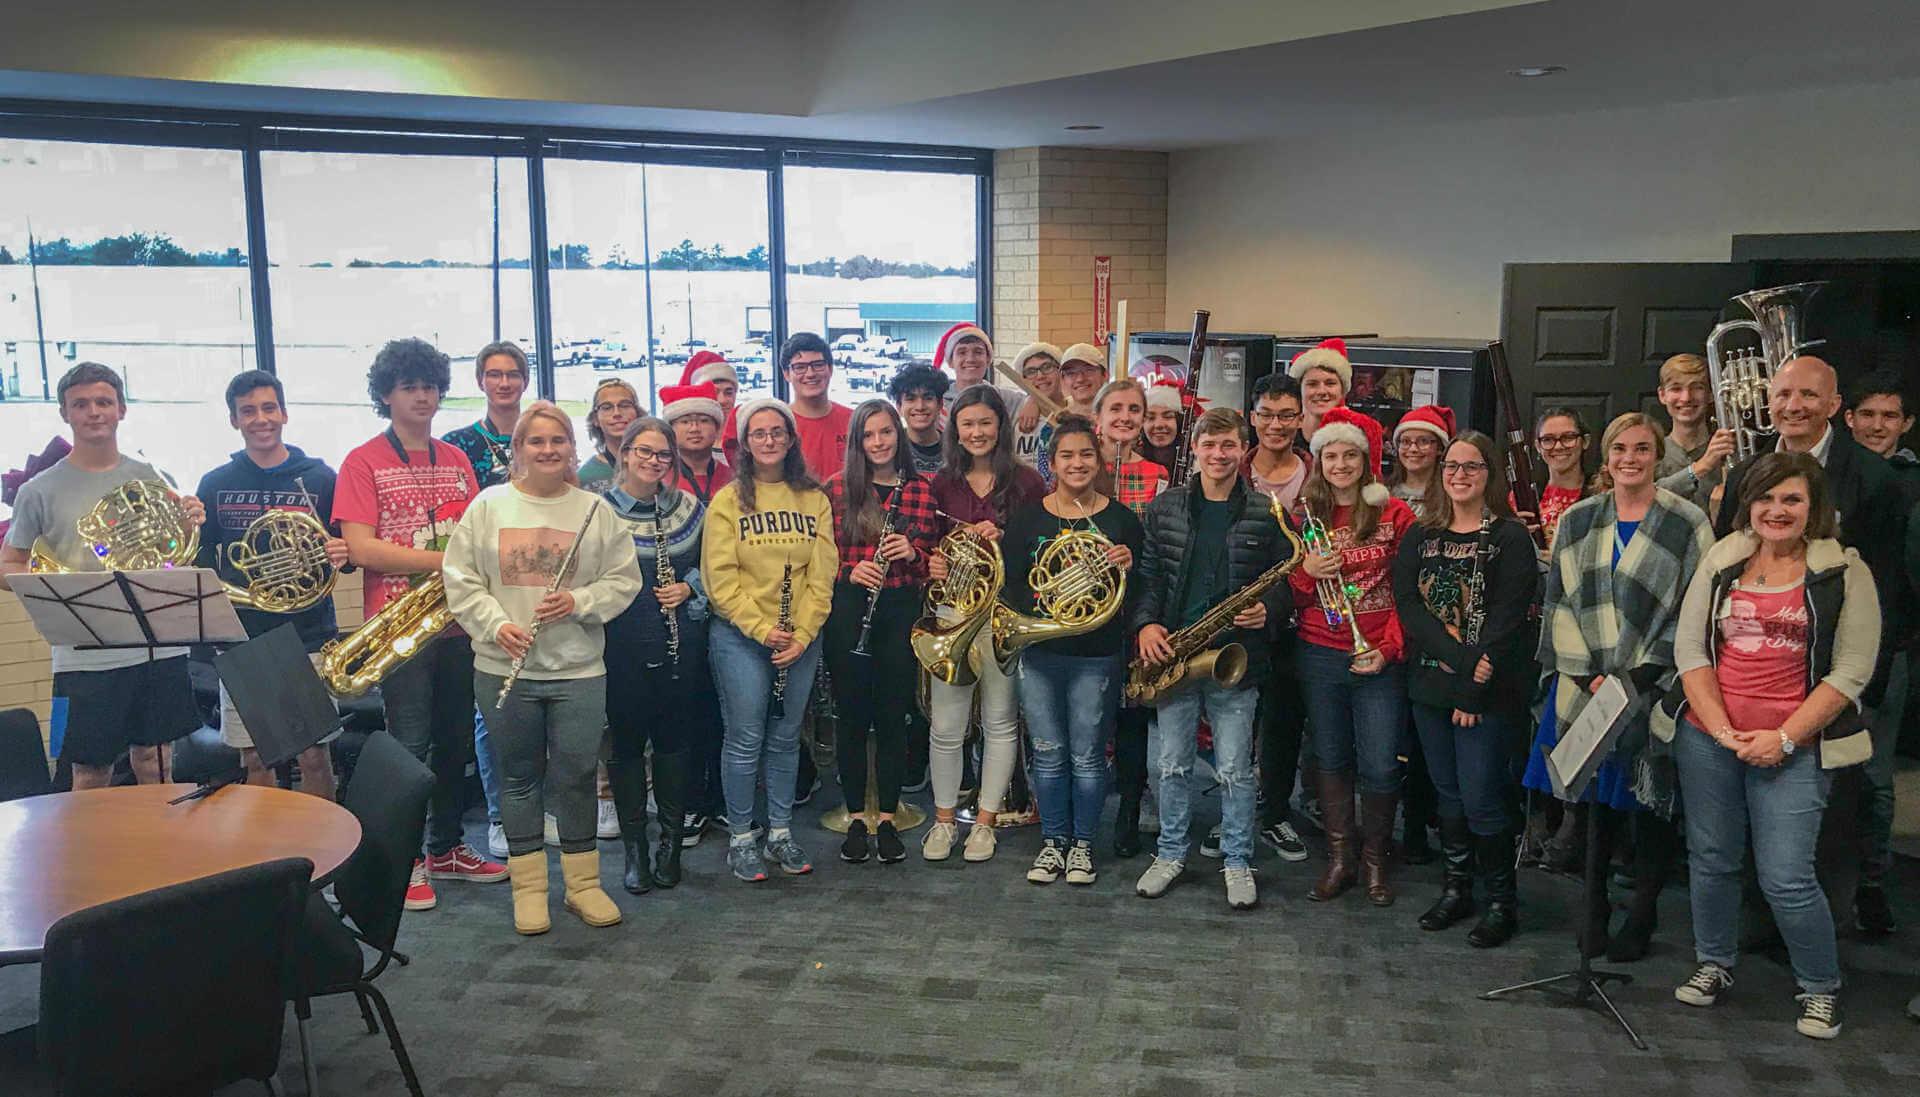 Klein Oak Wind Ensemble Plays Impromptu Concert at Central Office